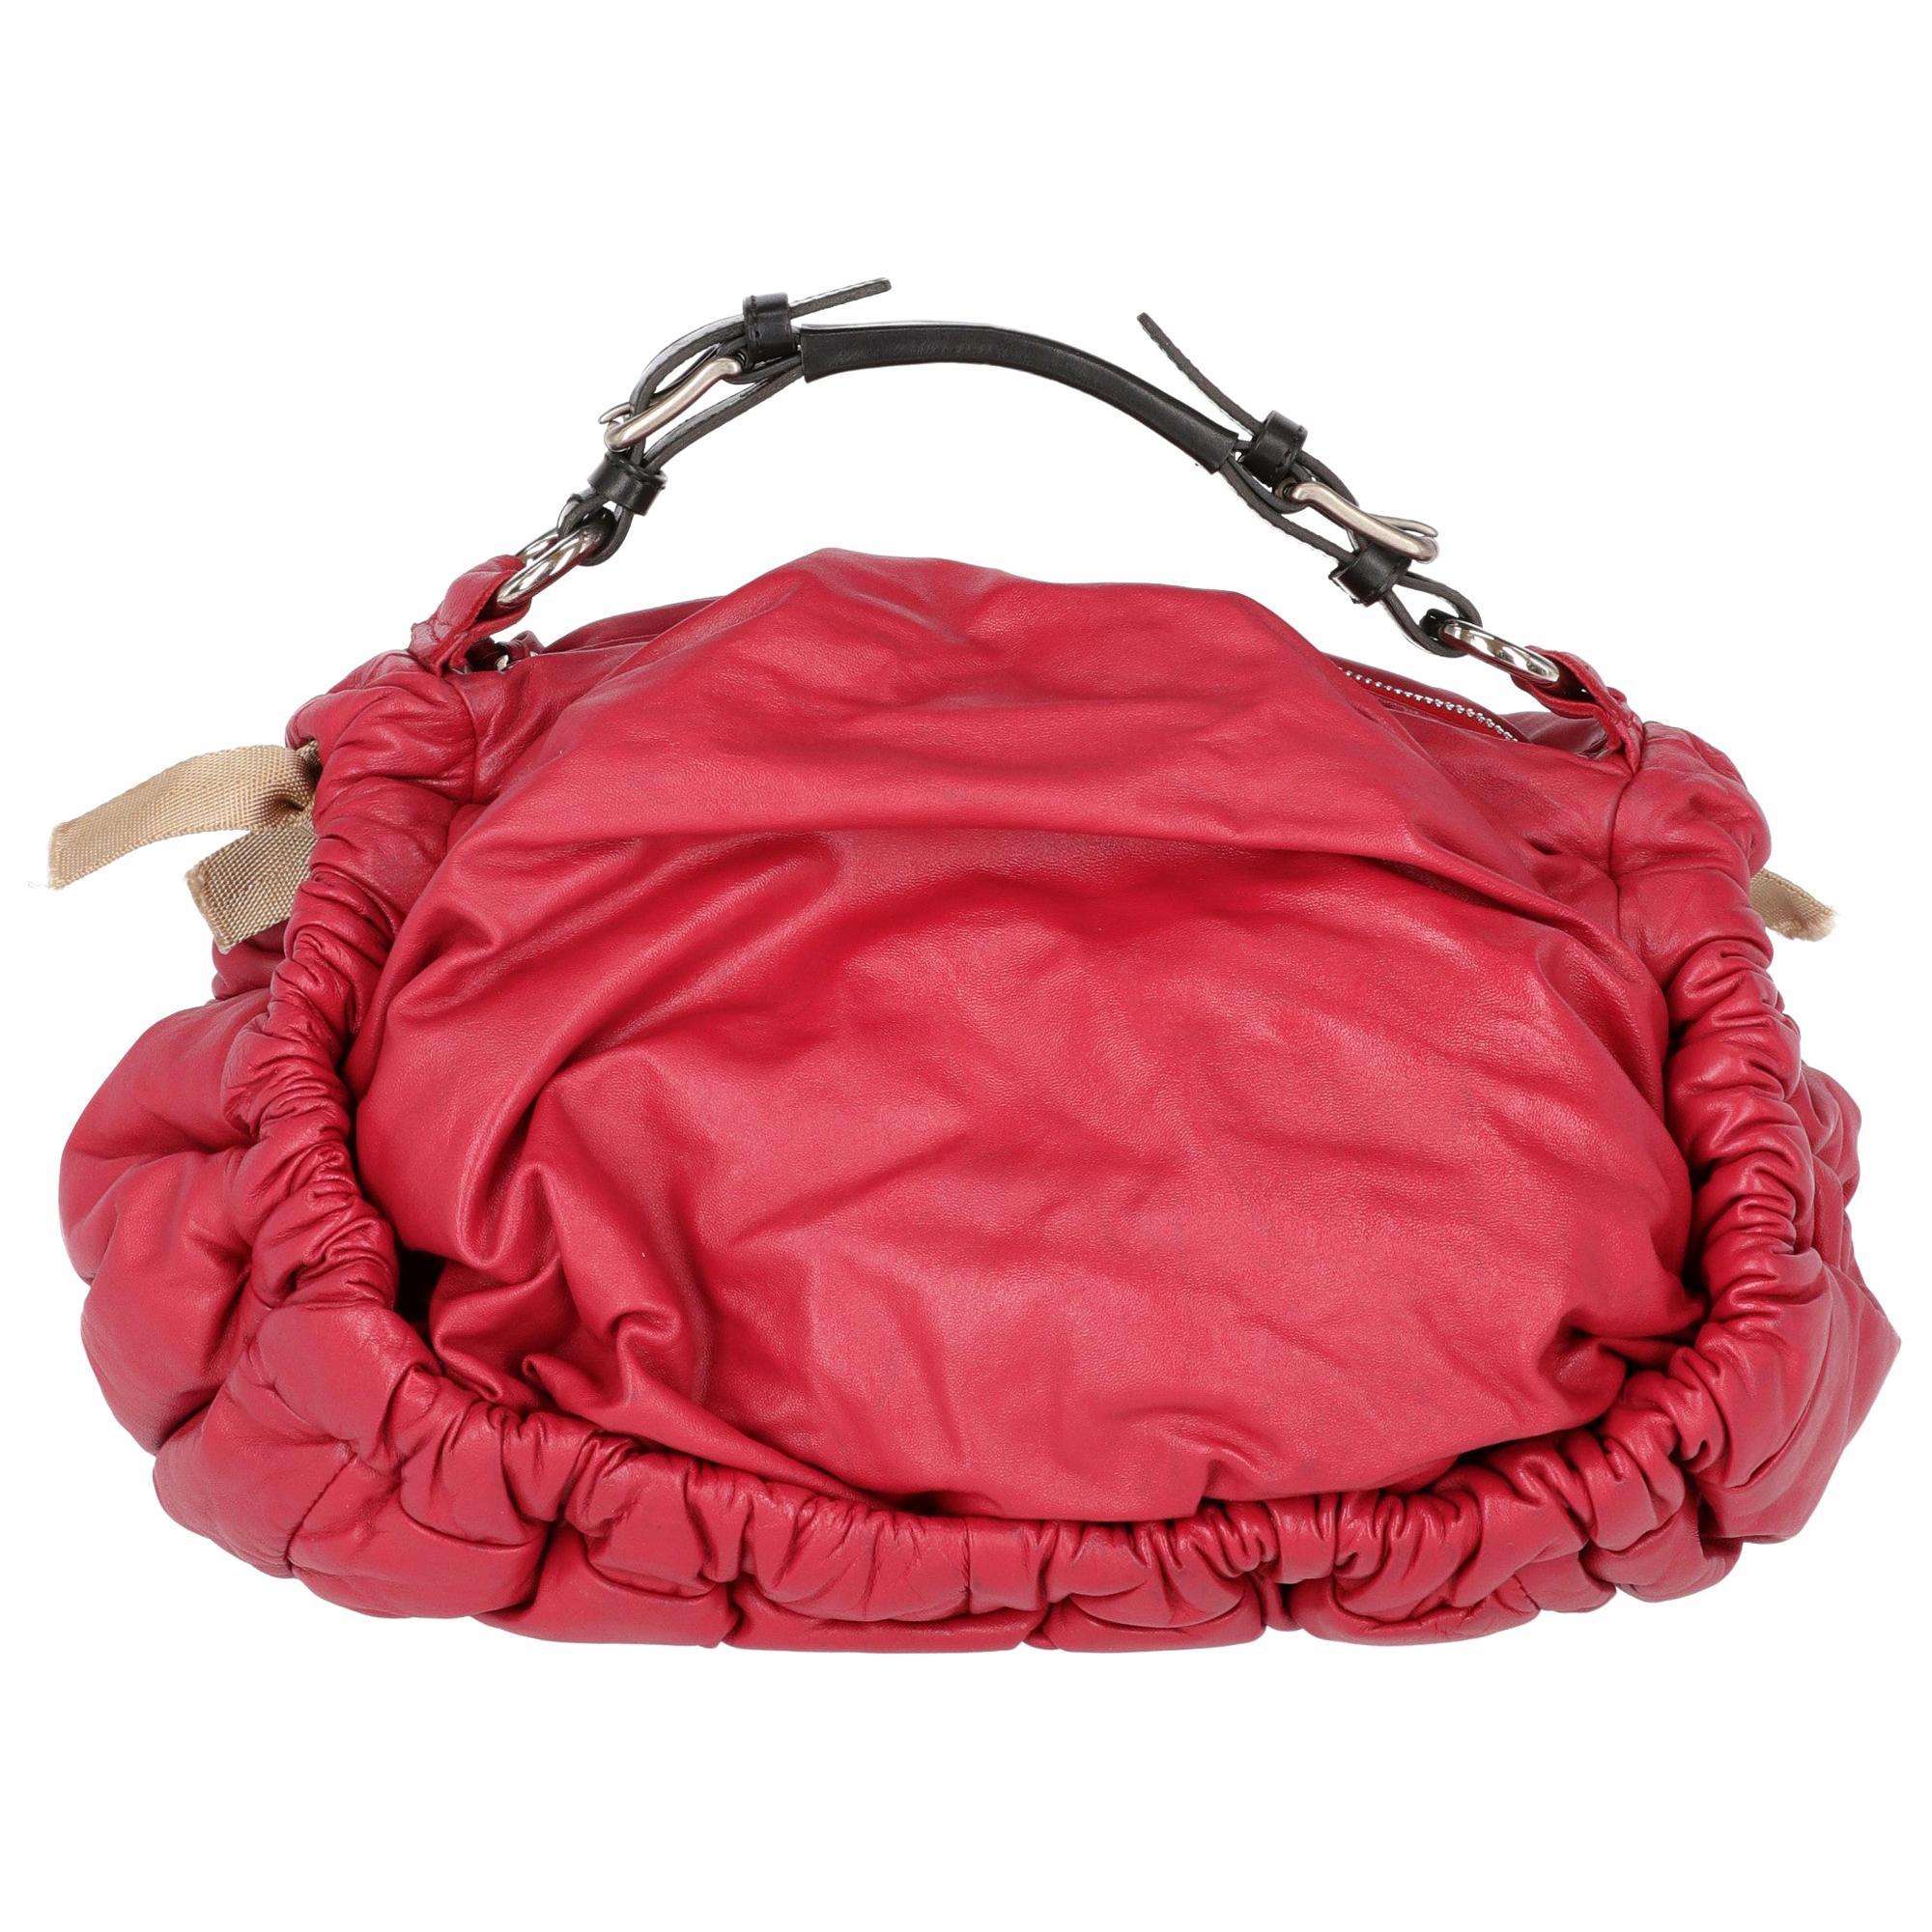 2000s Marni Magenta Leather Design Bag